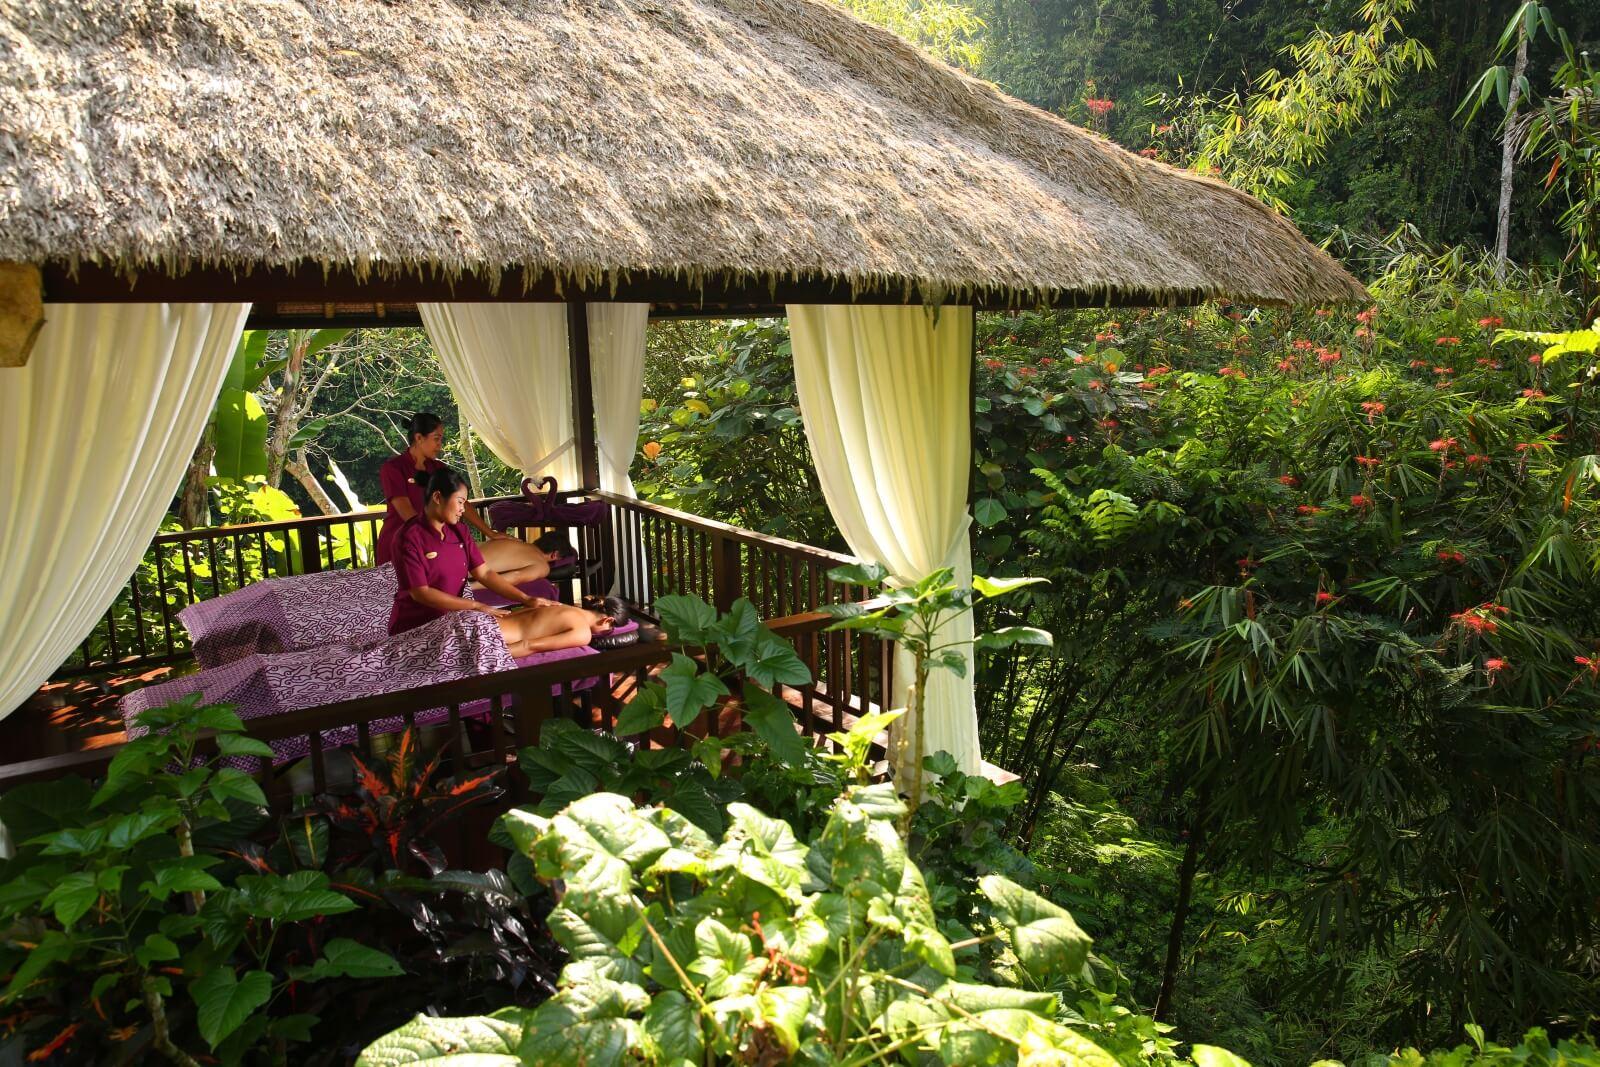 Spa at Hanging Gardens of Bali